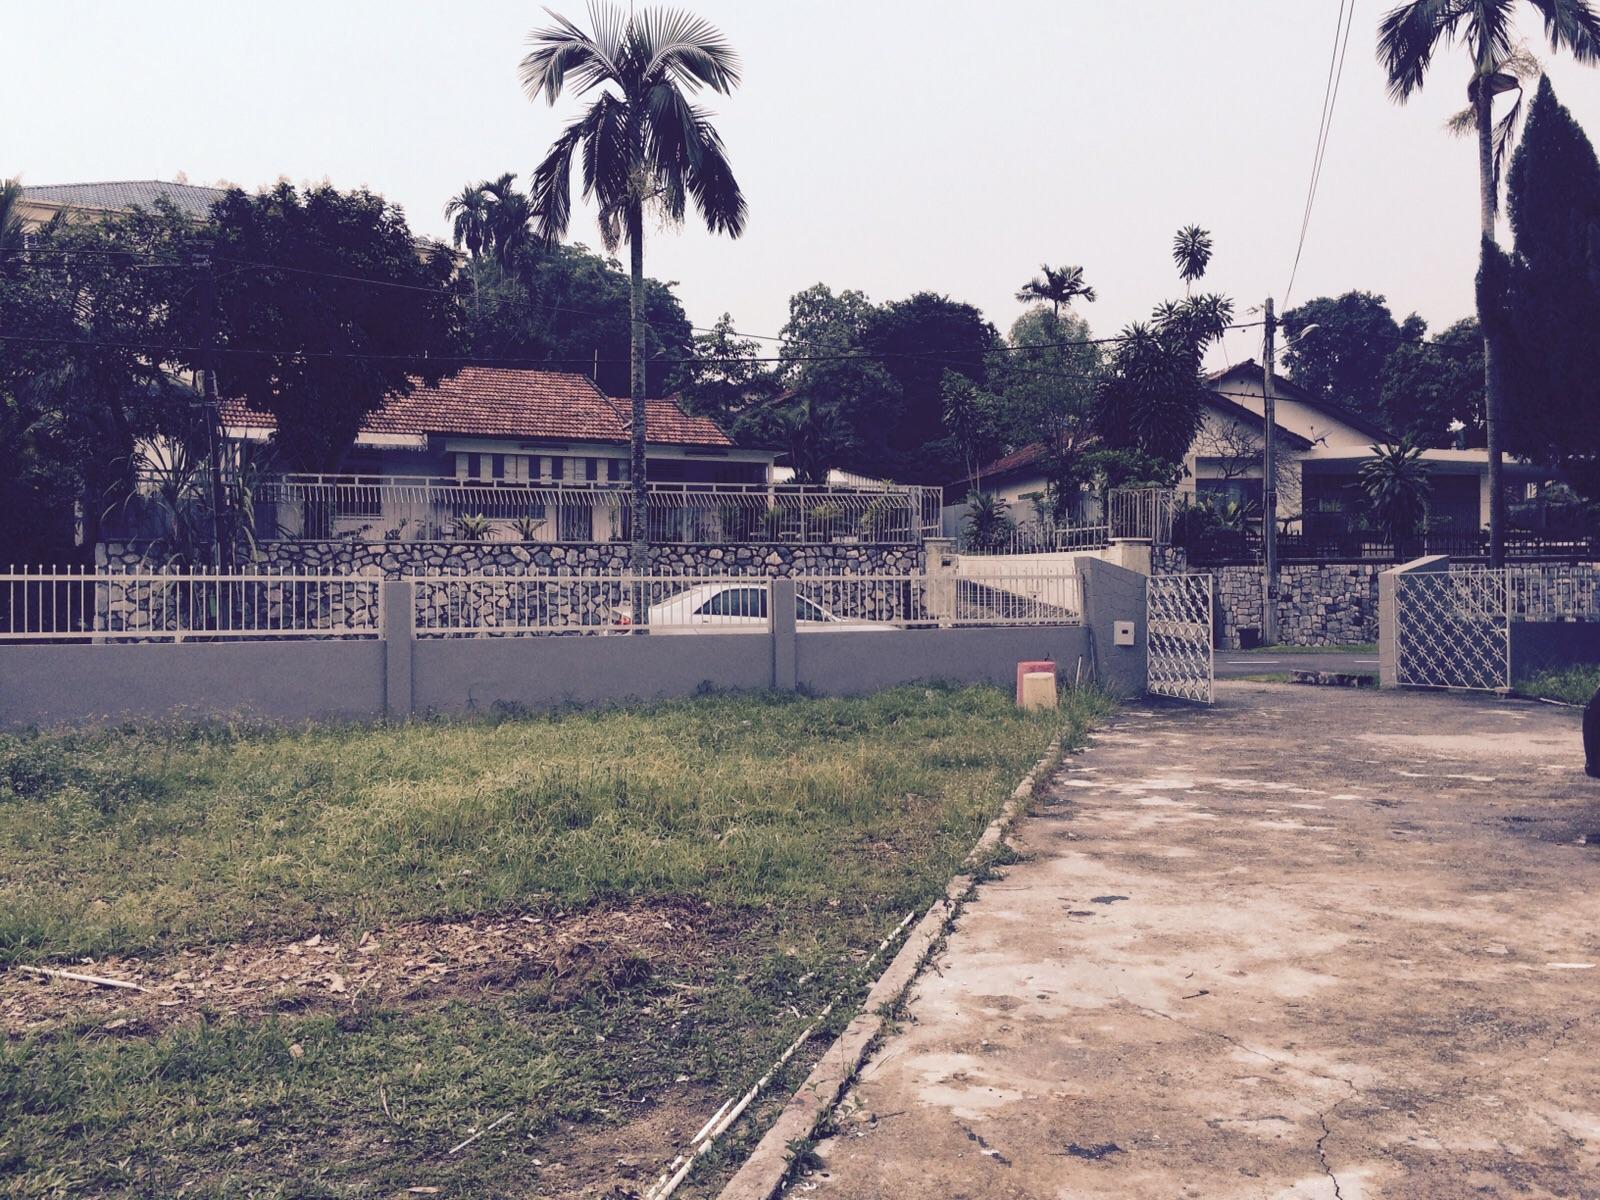 1 Storey Bungalow for Sale at Section 12 Petaling Jaya (Rebuild Potential)